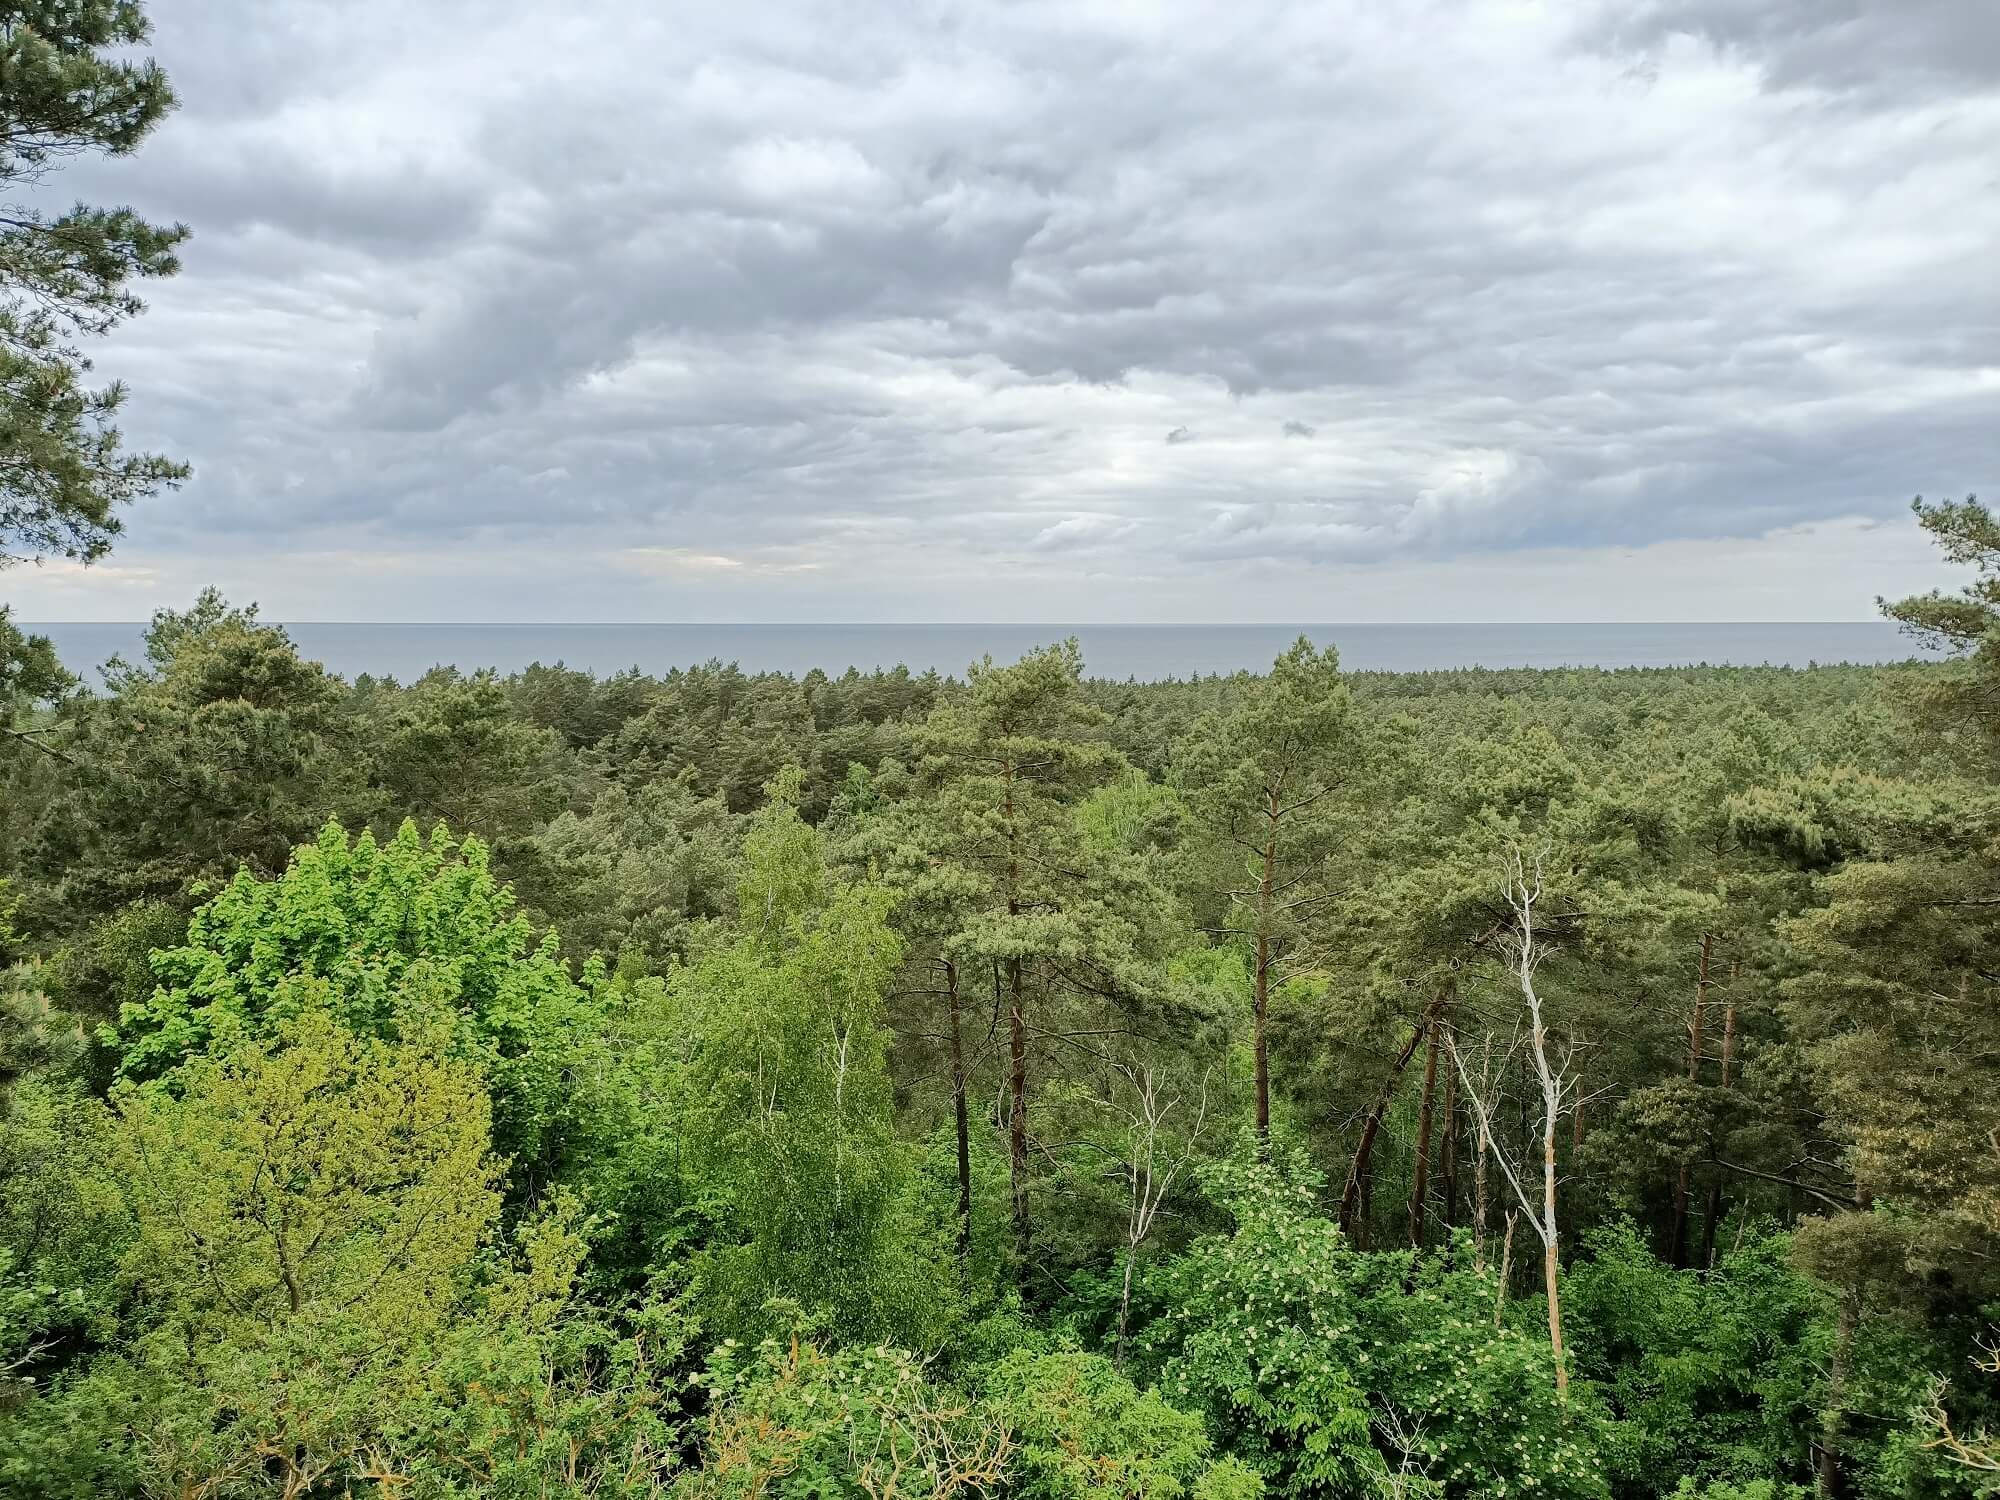 The Vistula Spit 3 - The Vistula Spit — a beautiful far reach of Poland